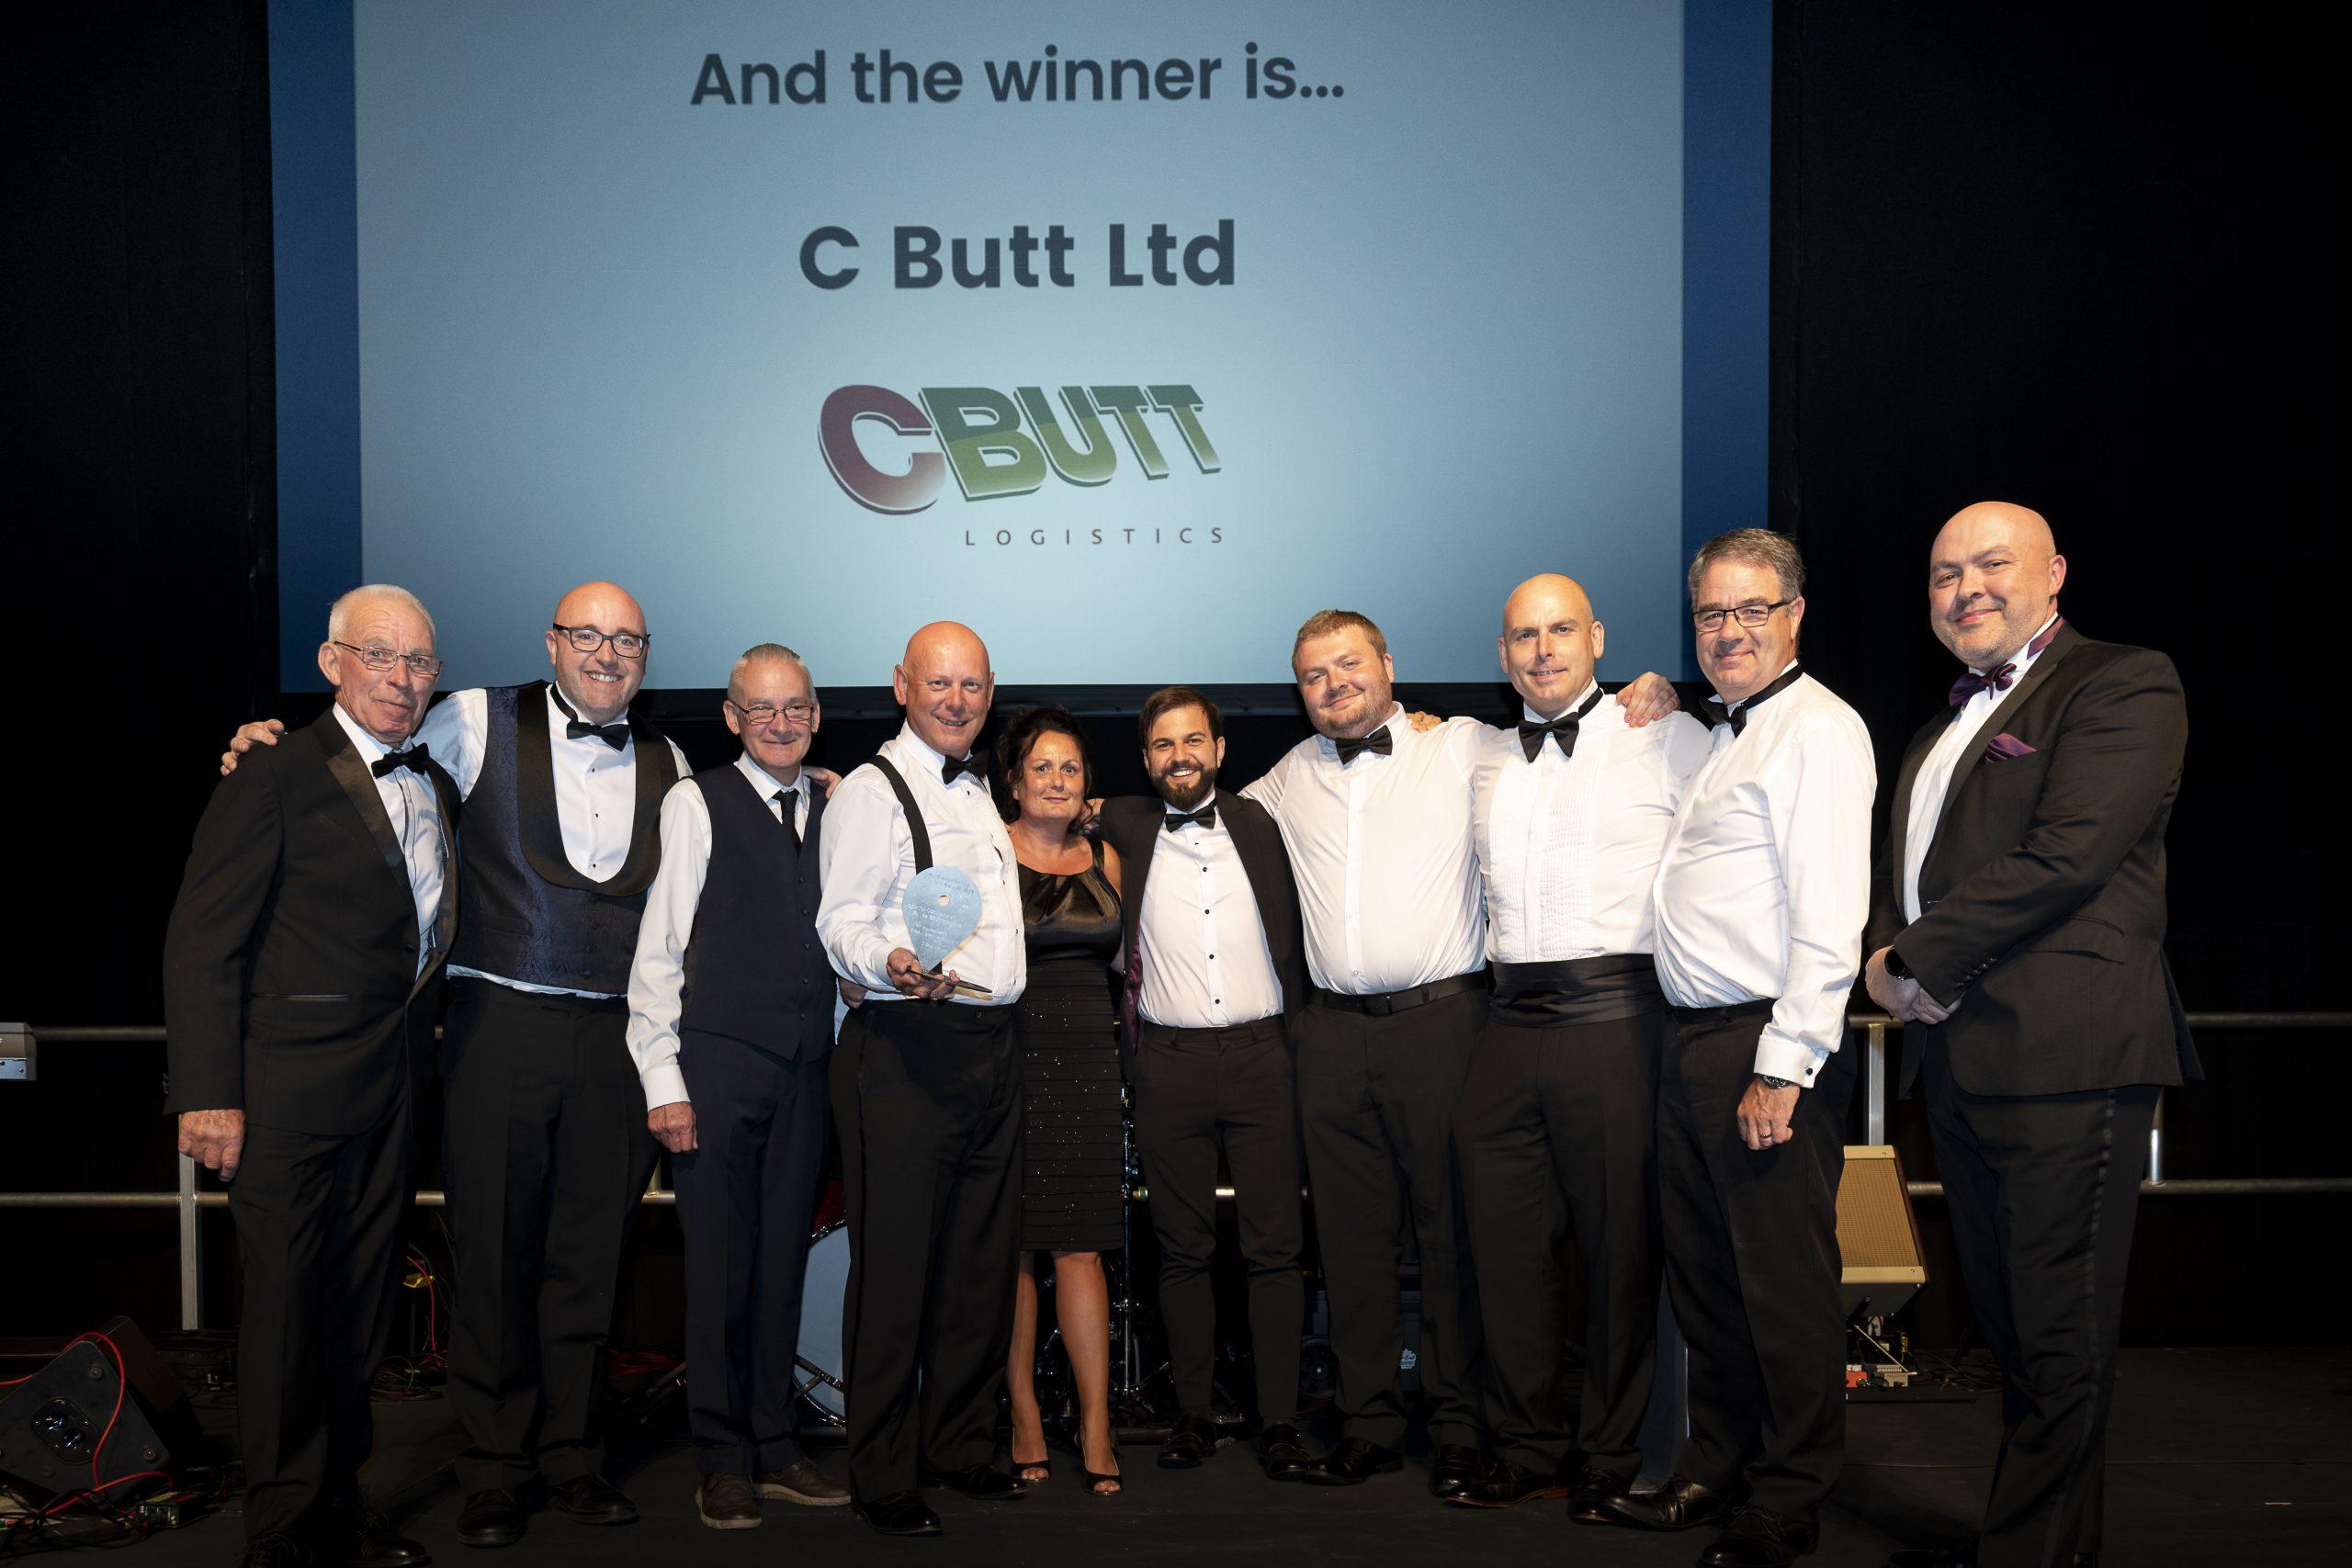 C BUTT Ltd Winners